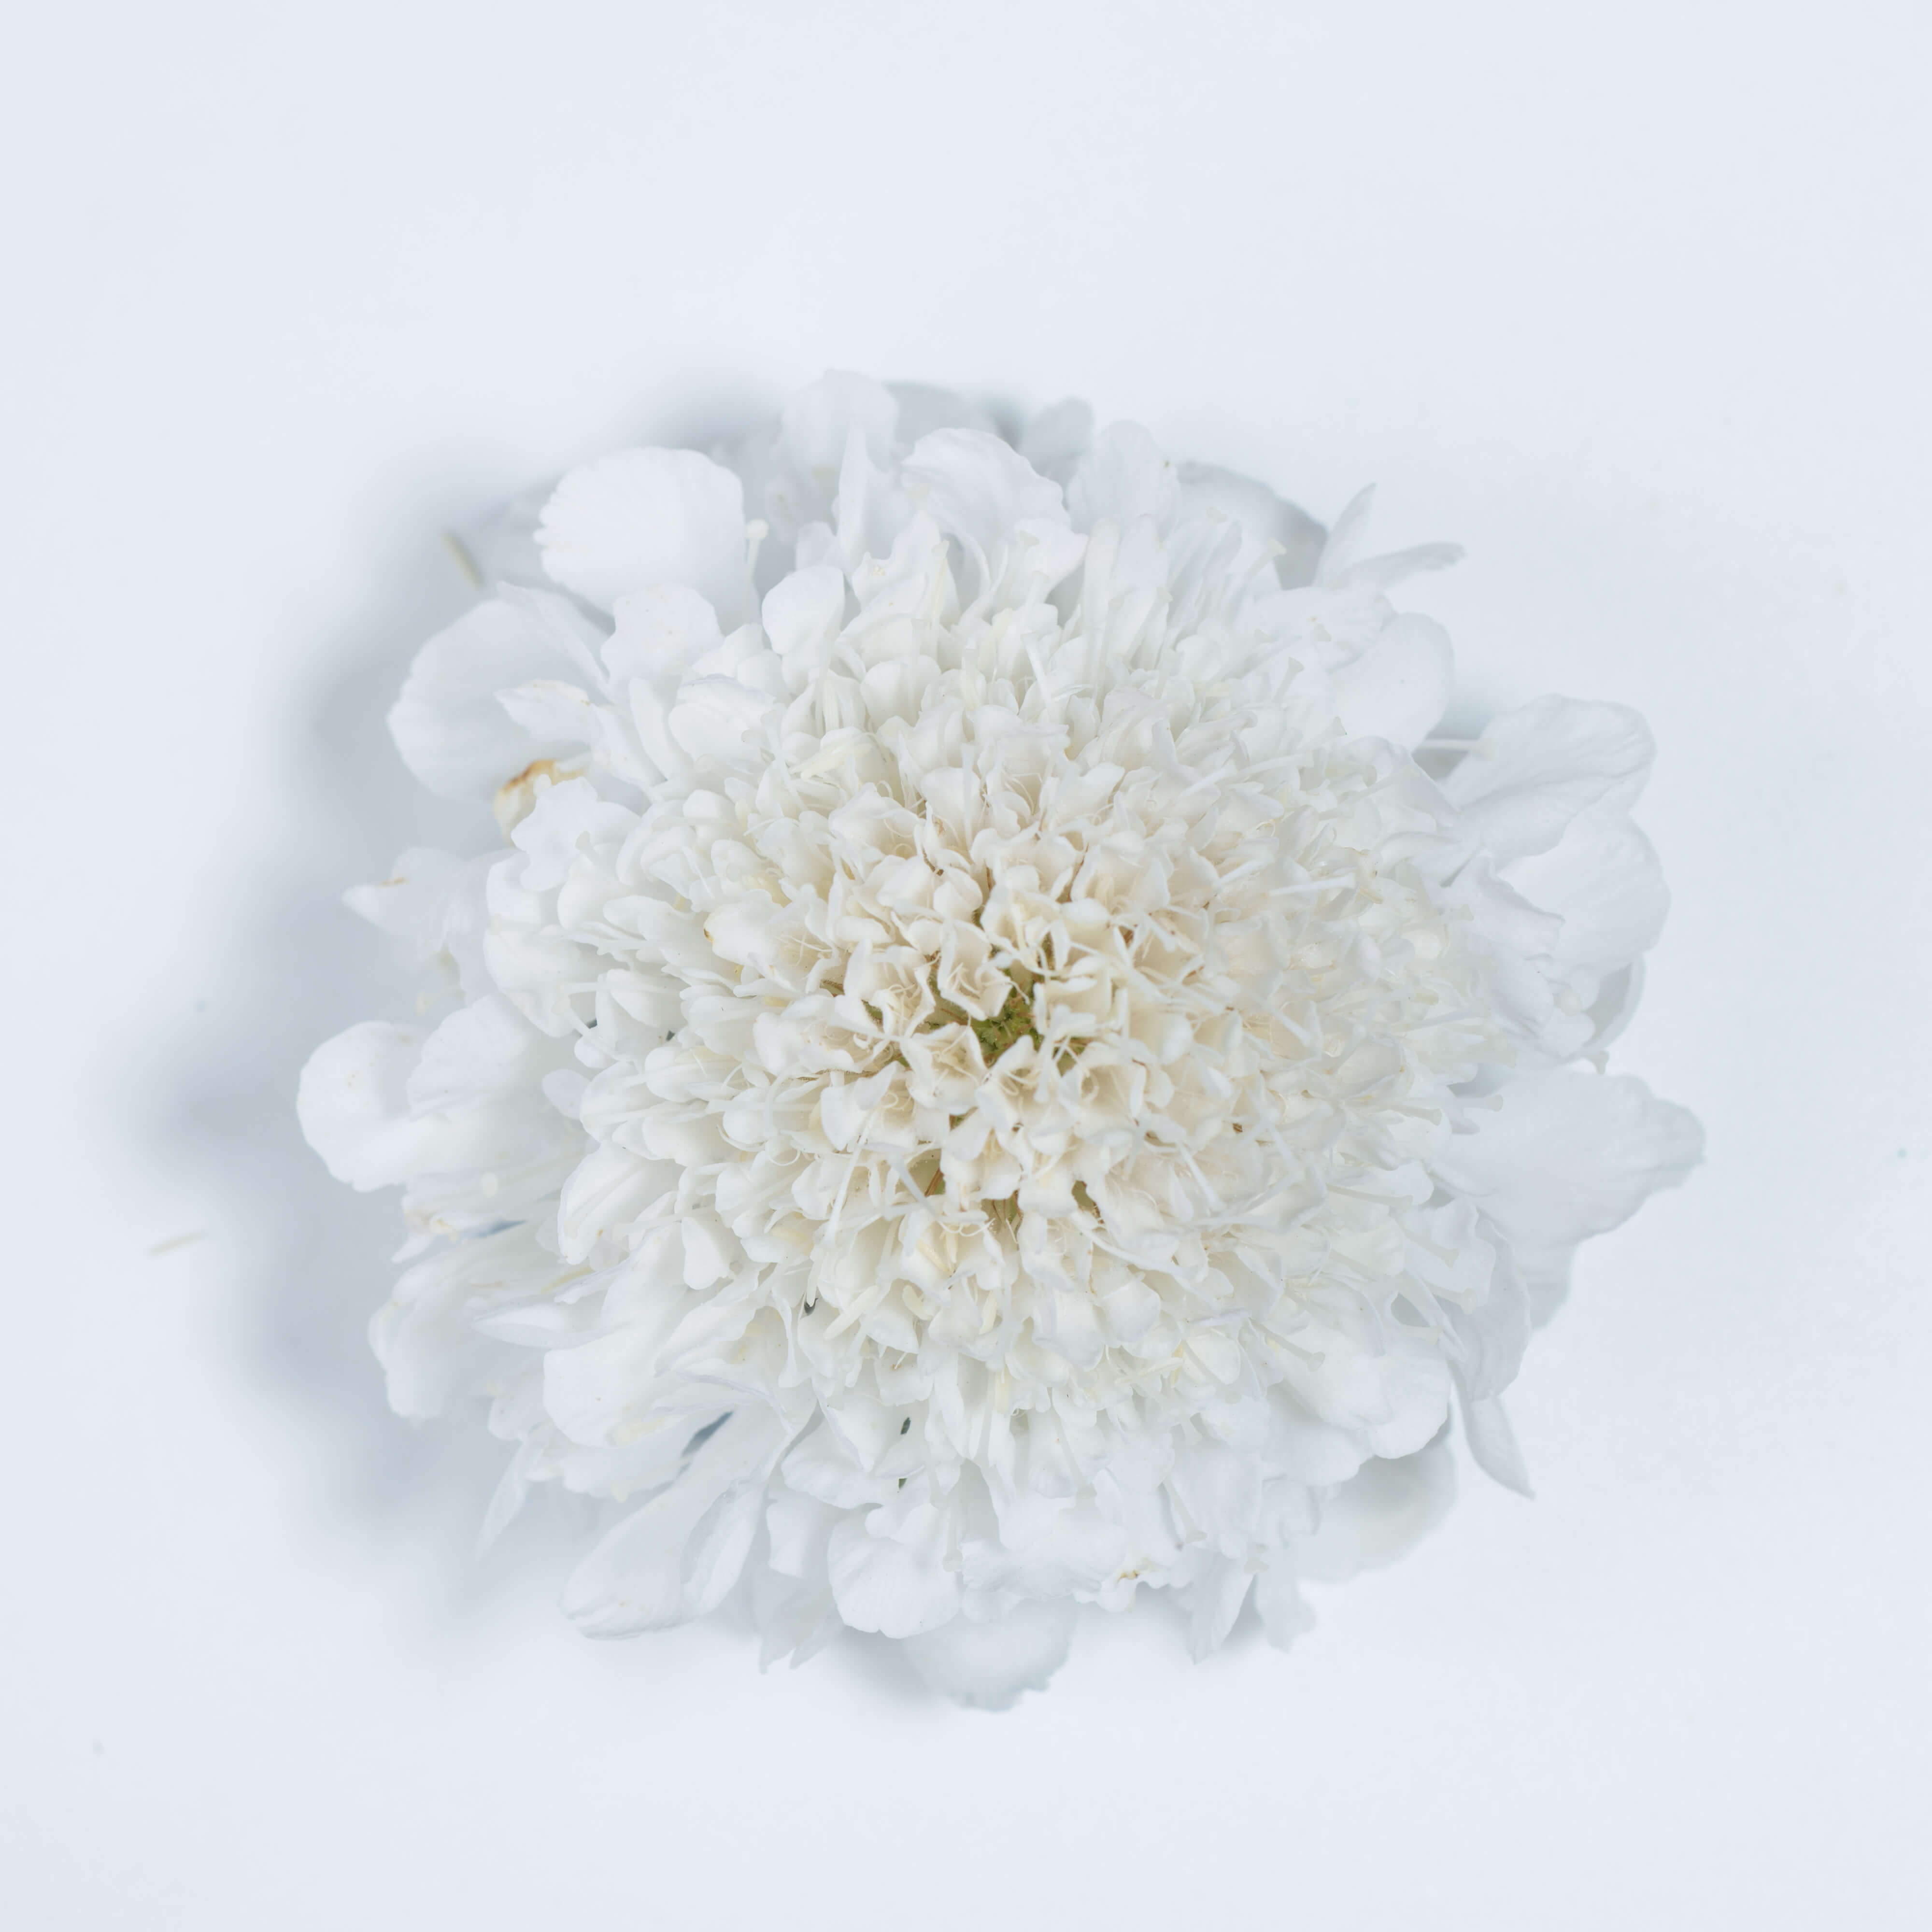 Scabiosa Milky Scoop Pincushion Flower Cut Flowers Danziger